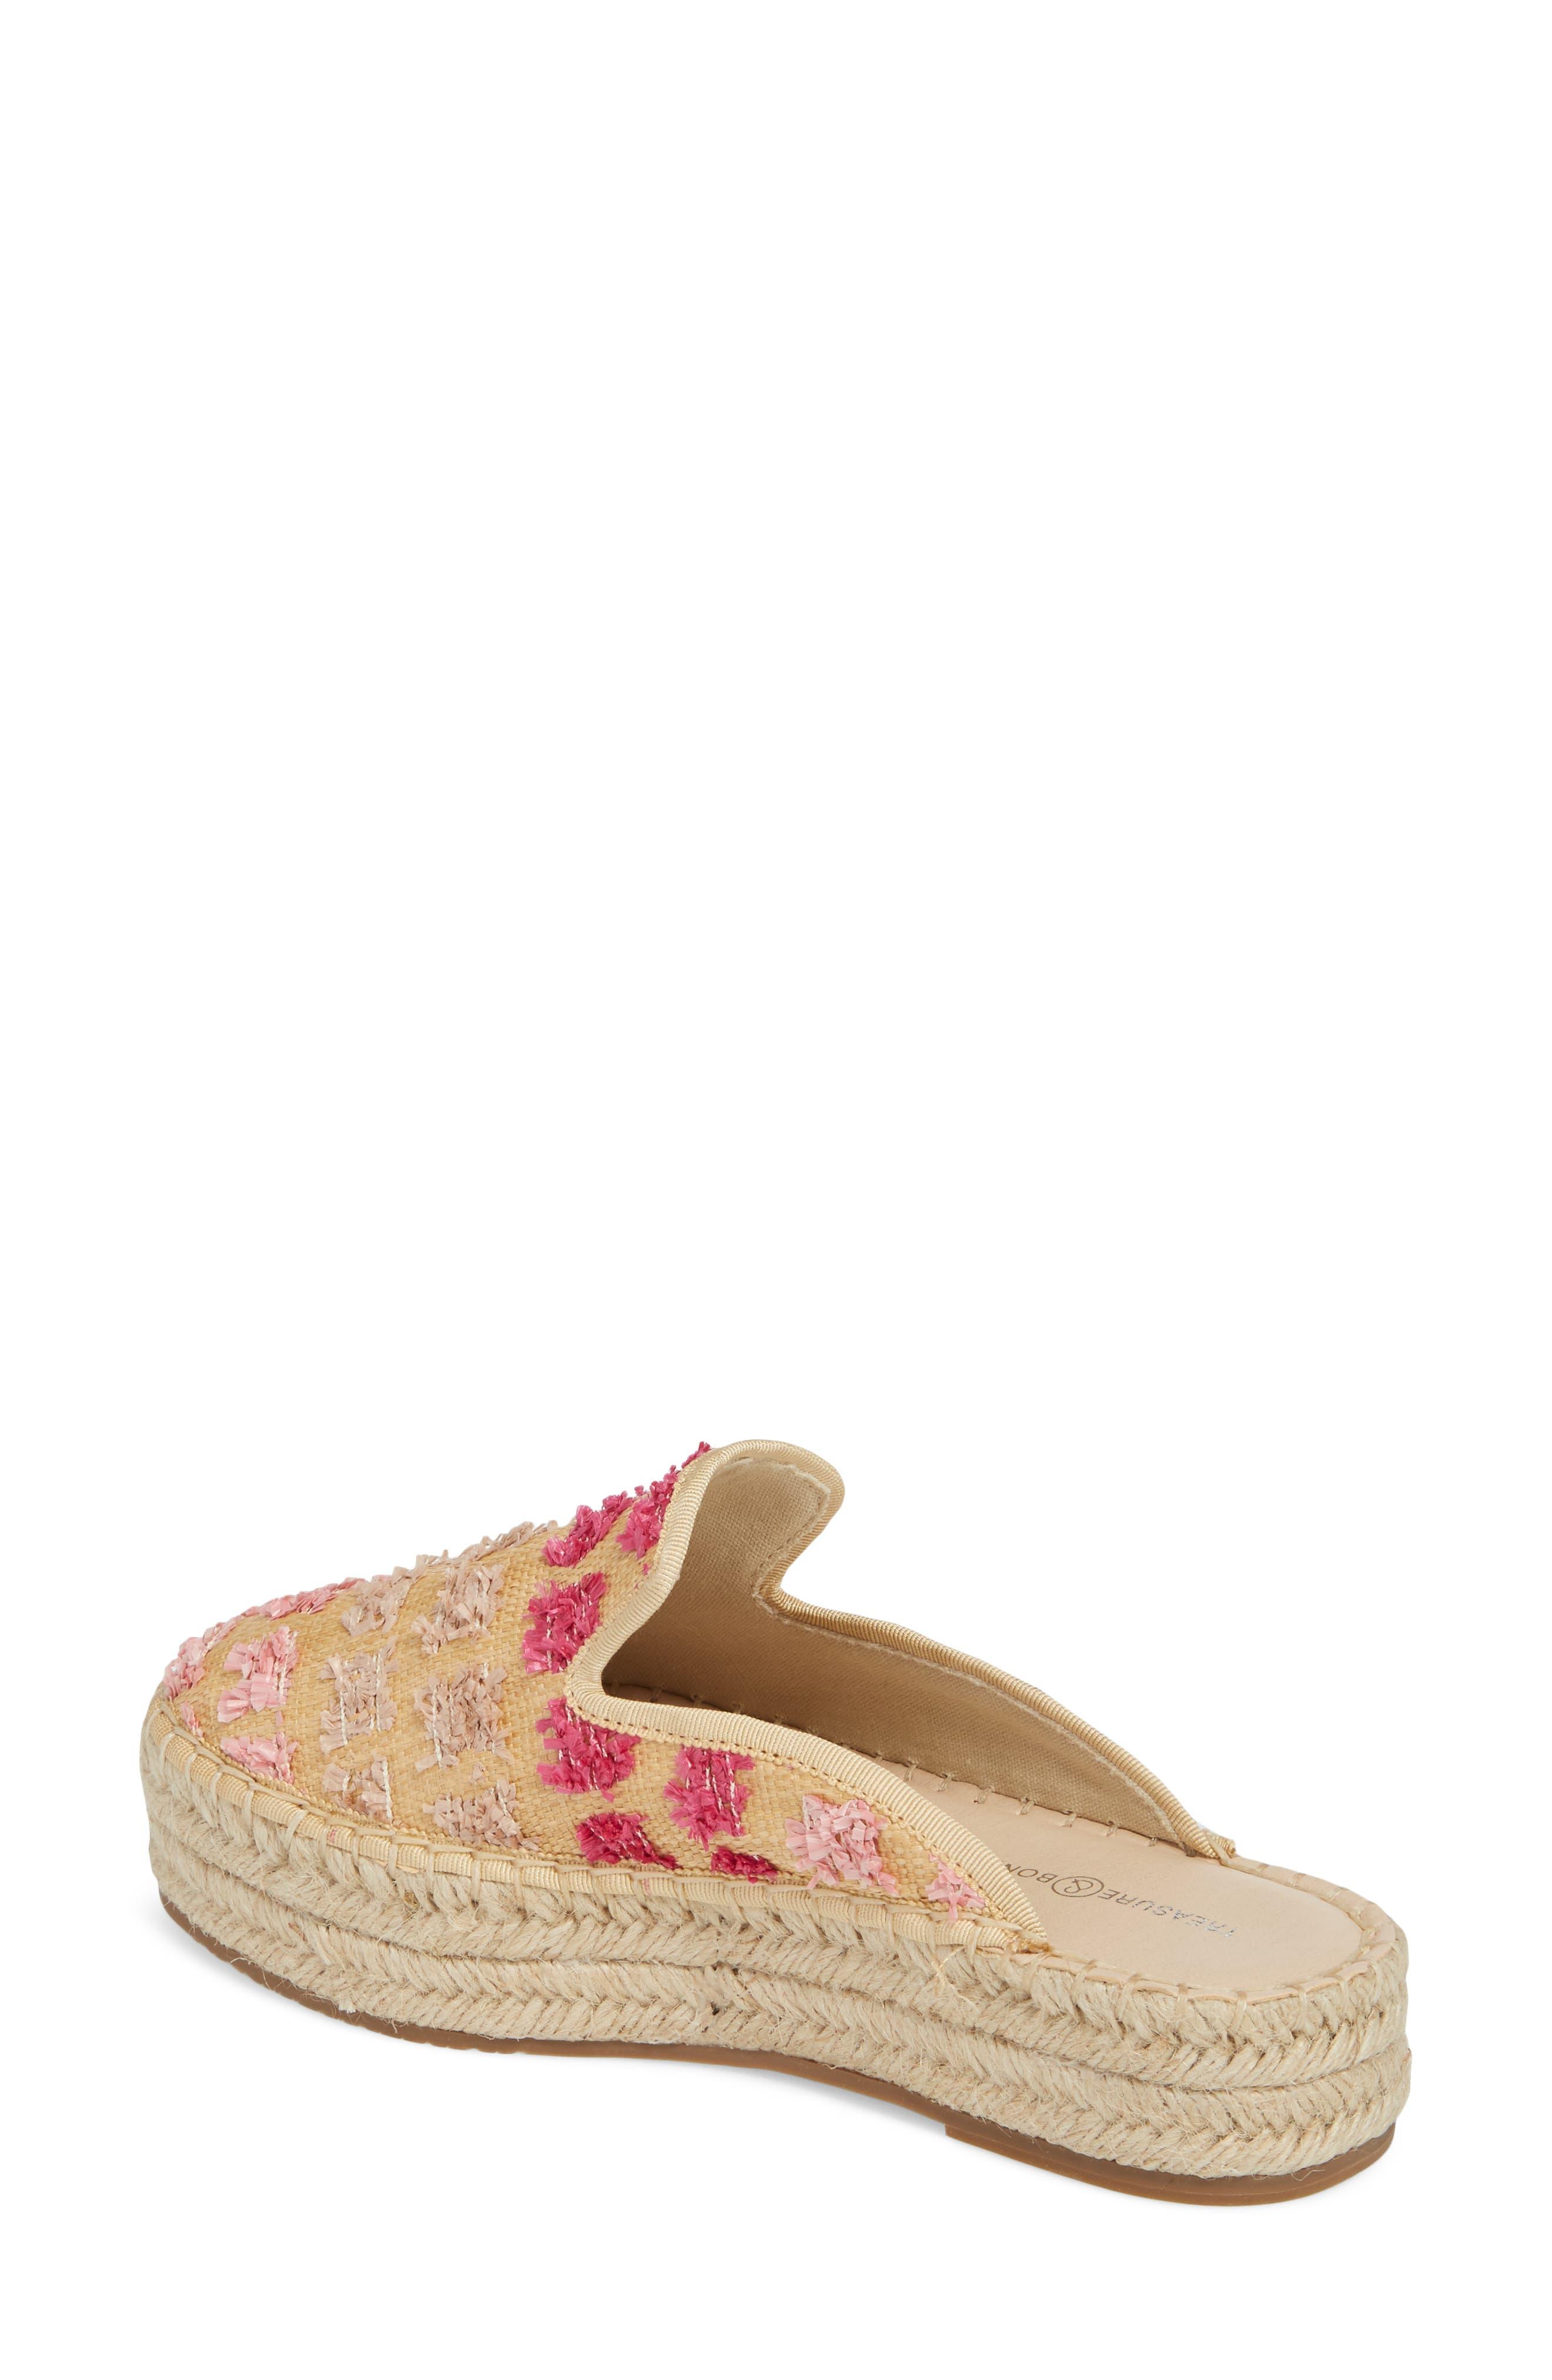 Marlowe Tufted Espadrille Loafer Mule,                             Alternate thumbnail 2, color,                             Pink Multi Faux Raffia